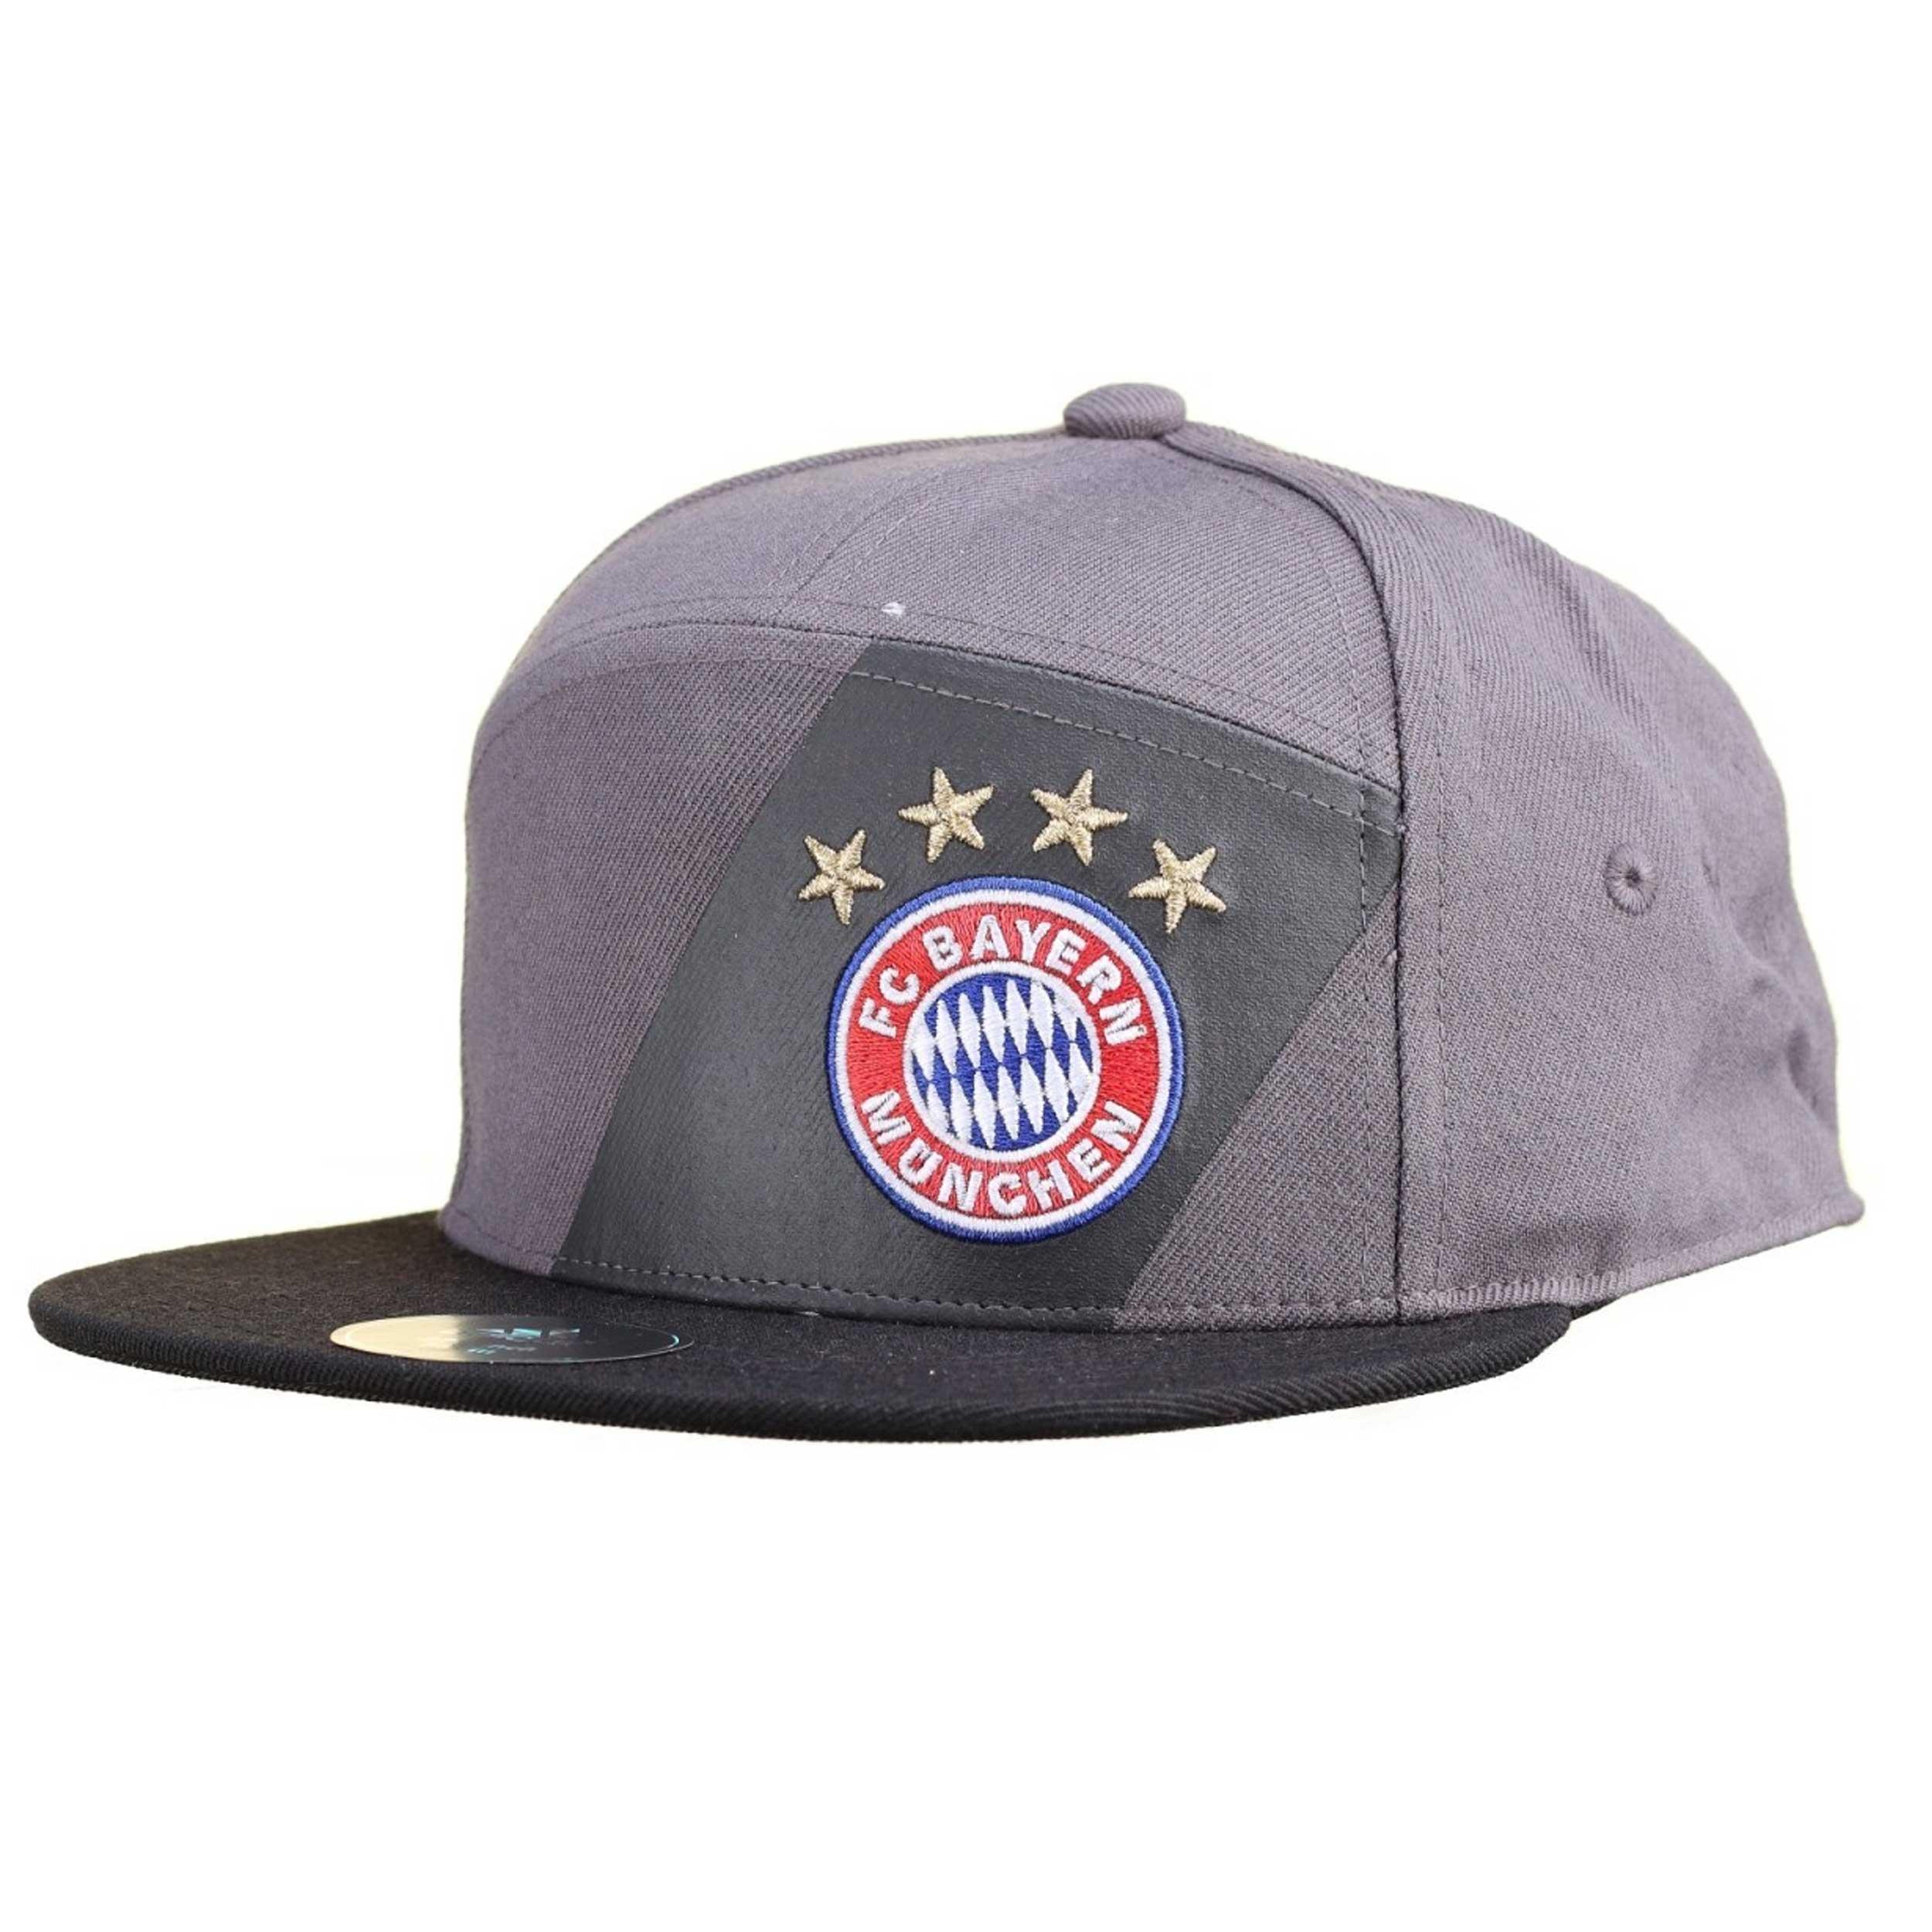 کلاه مردانه آدیداس مدل S95775